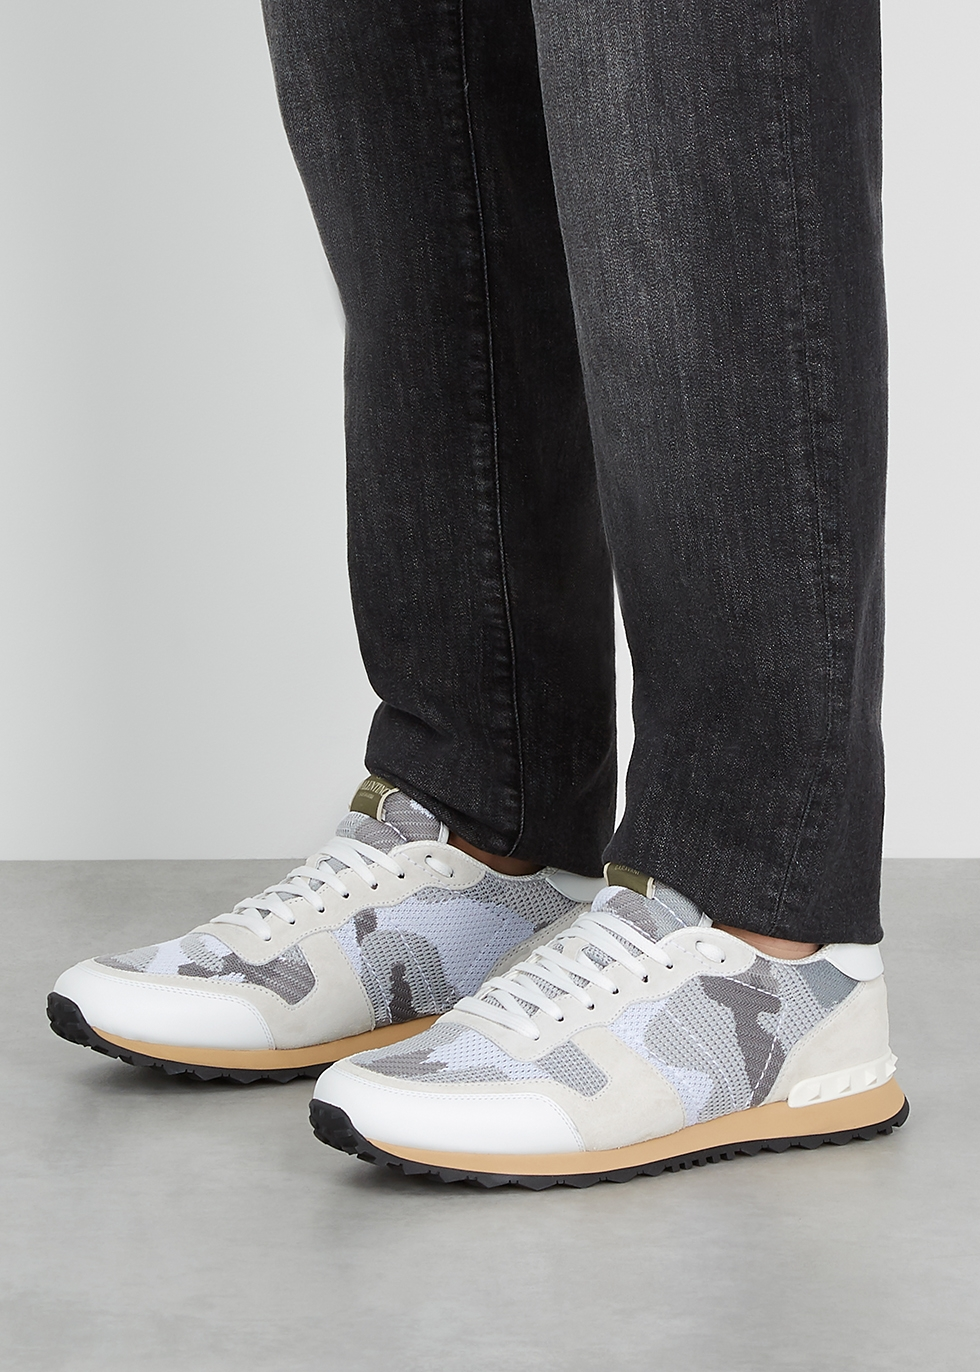 valentino grey camo sneakers